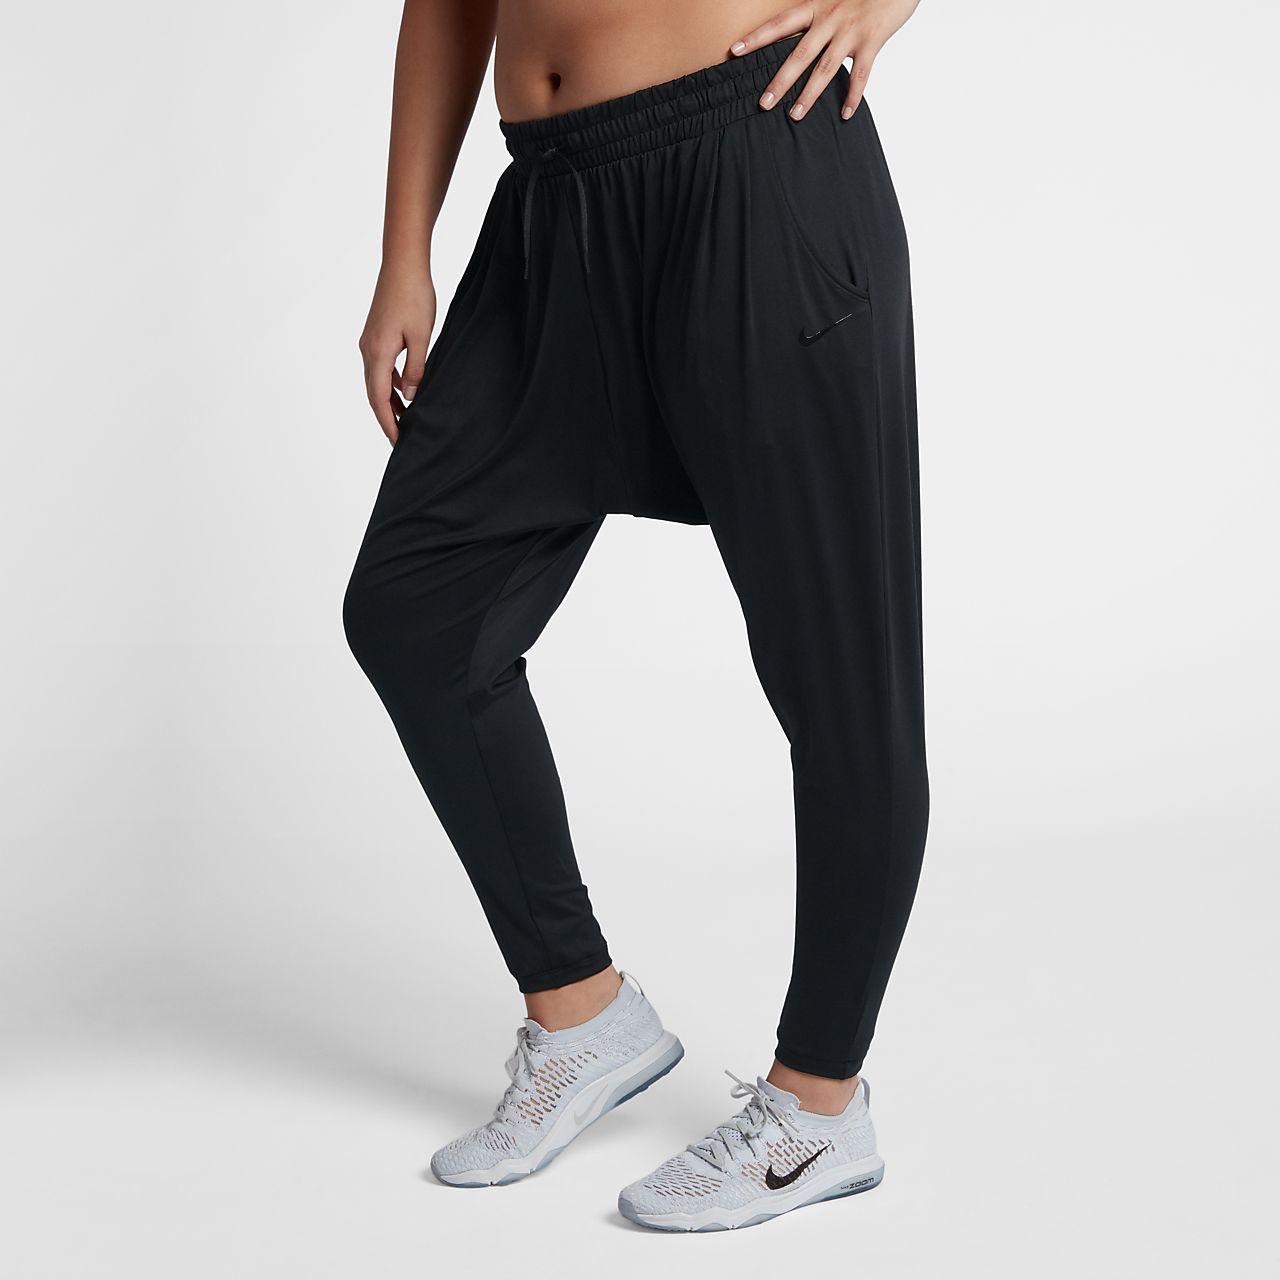 Nike Dri-FIT Flow Trainings-Hose für Damen (große Größe)